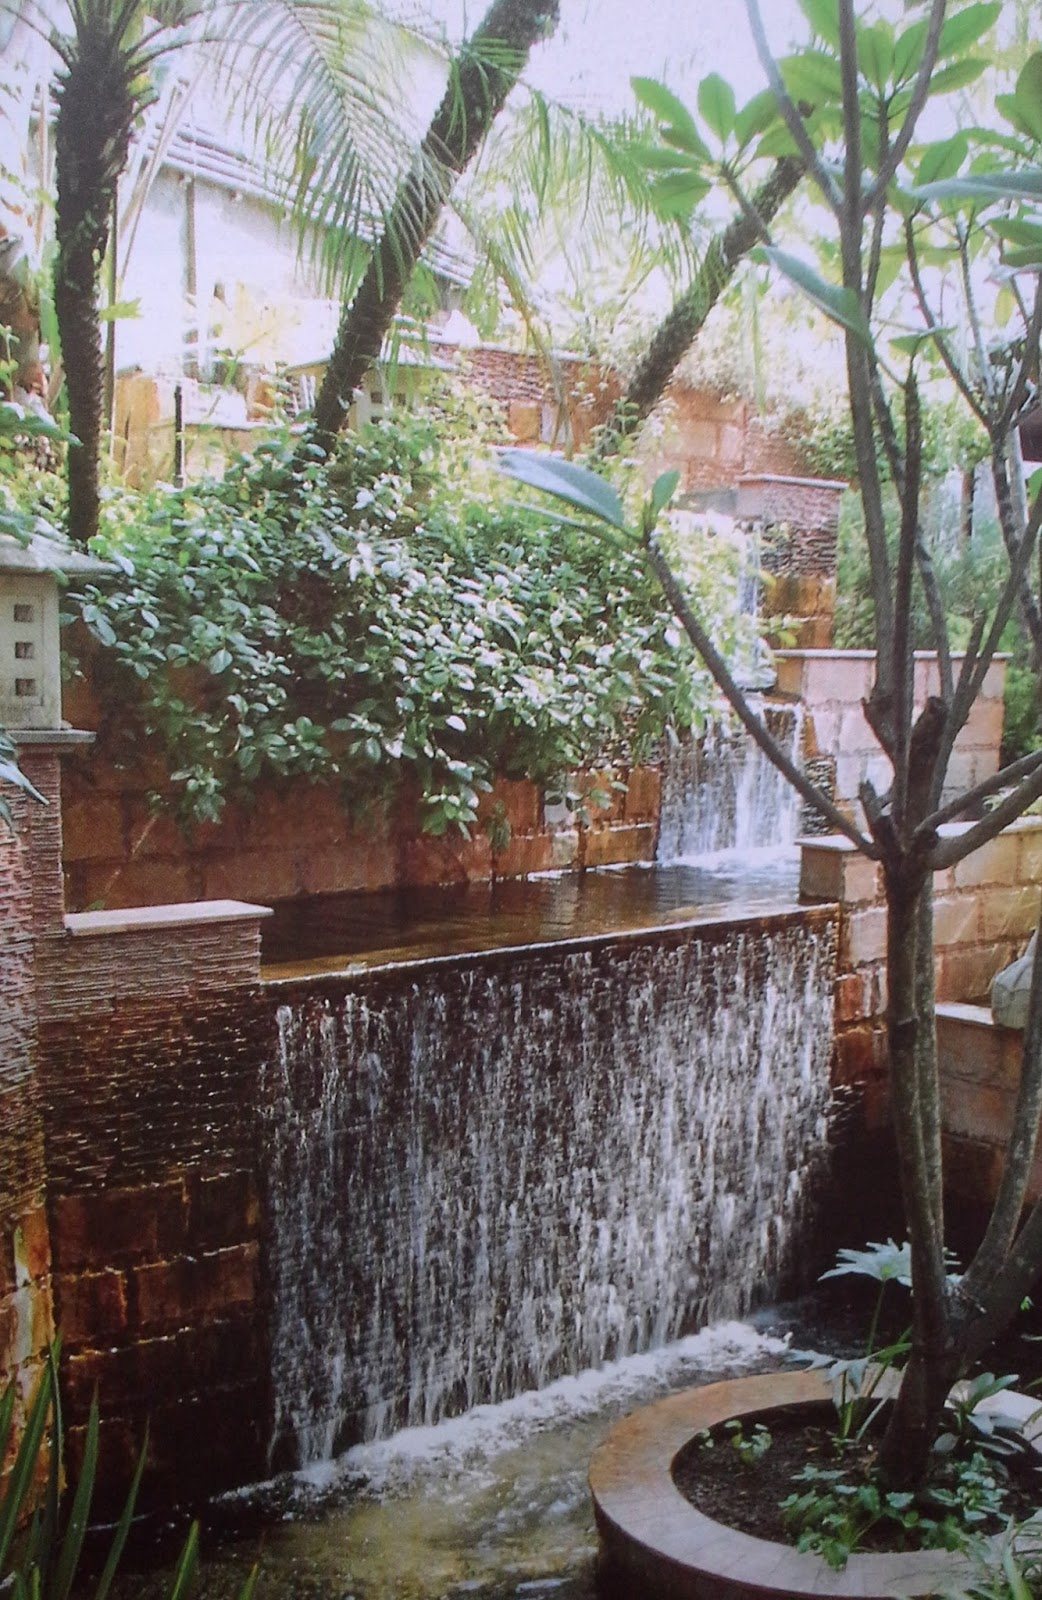 Jasa Tukang Taman Surabaya | Taman water feature water wall dan kolam koi